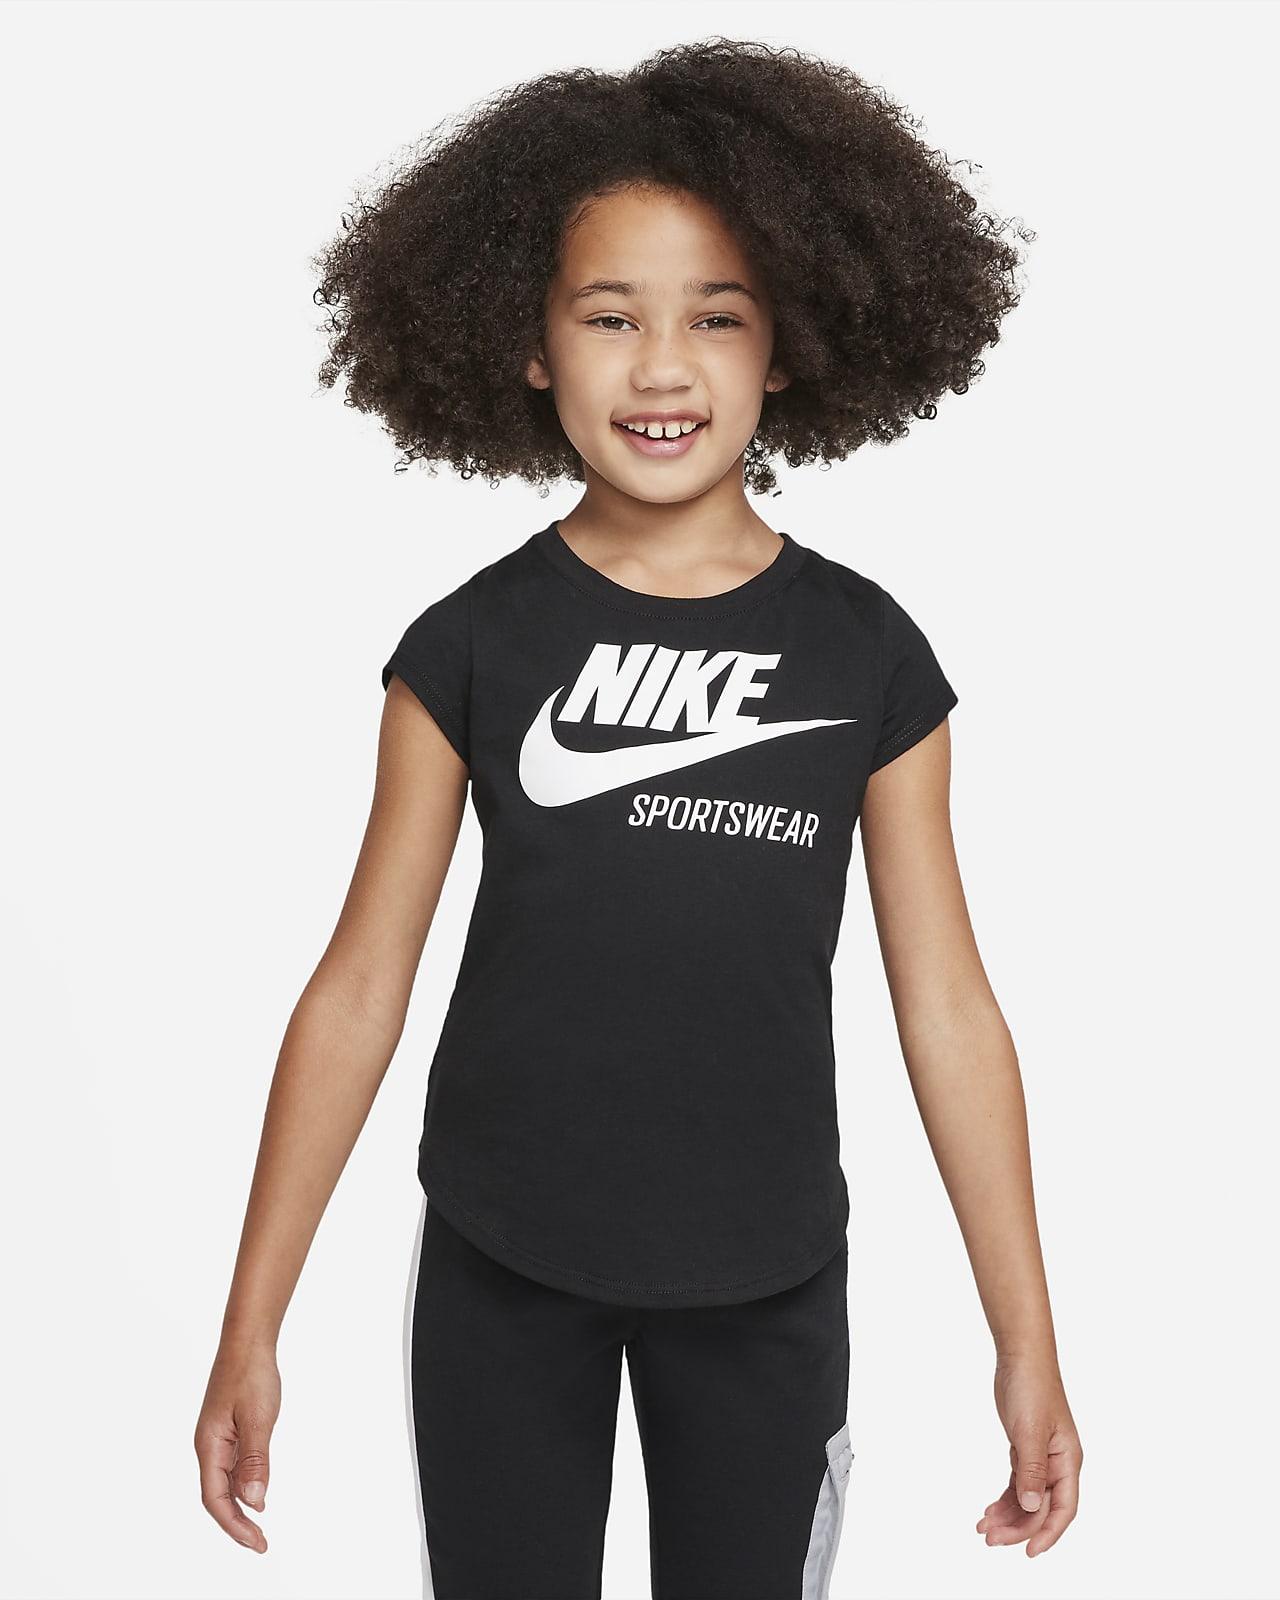 T-Shirt Nike Sportswear para criança